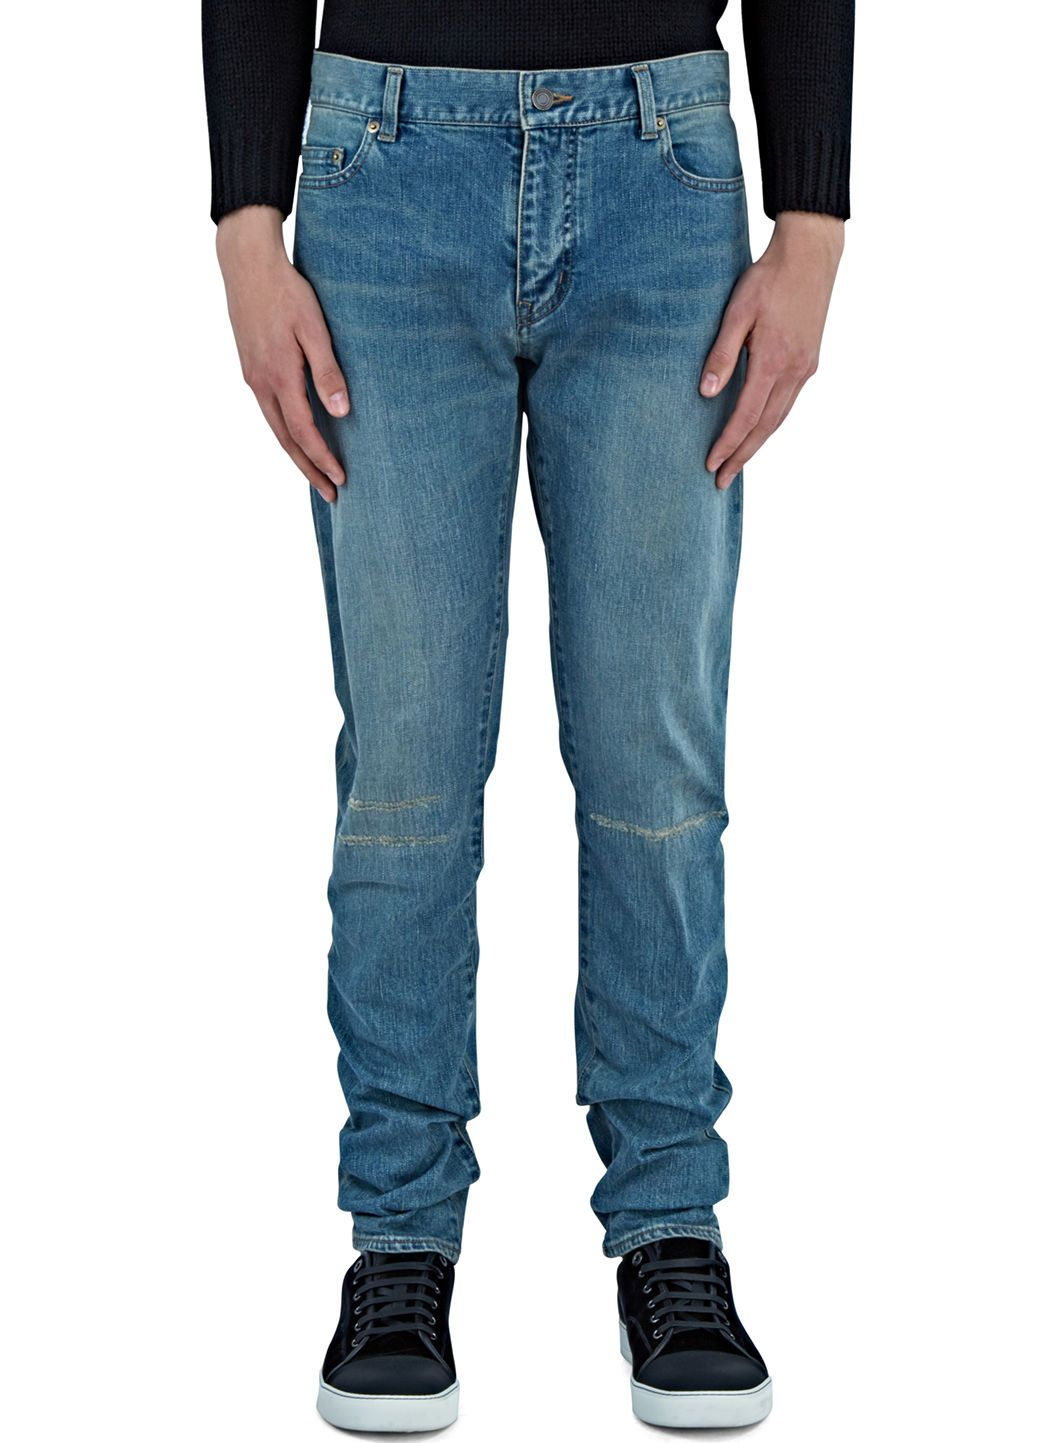 Destroyed knee skinny jeans